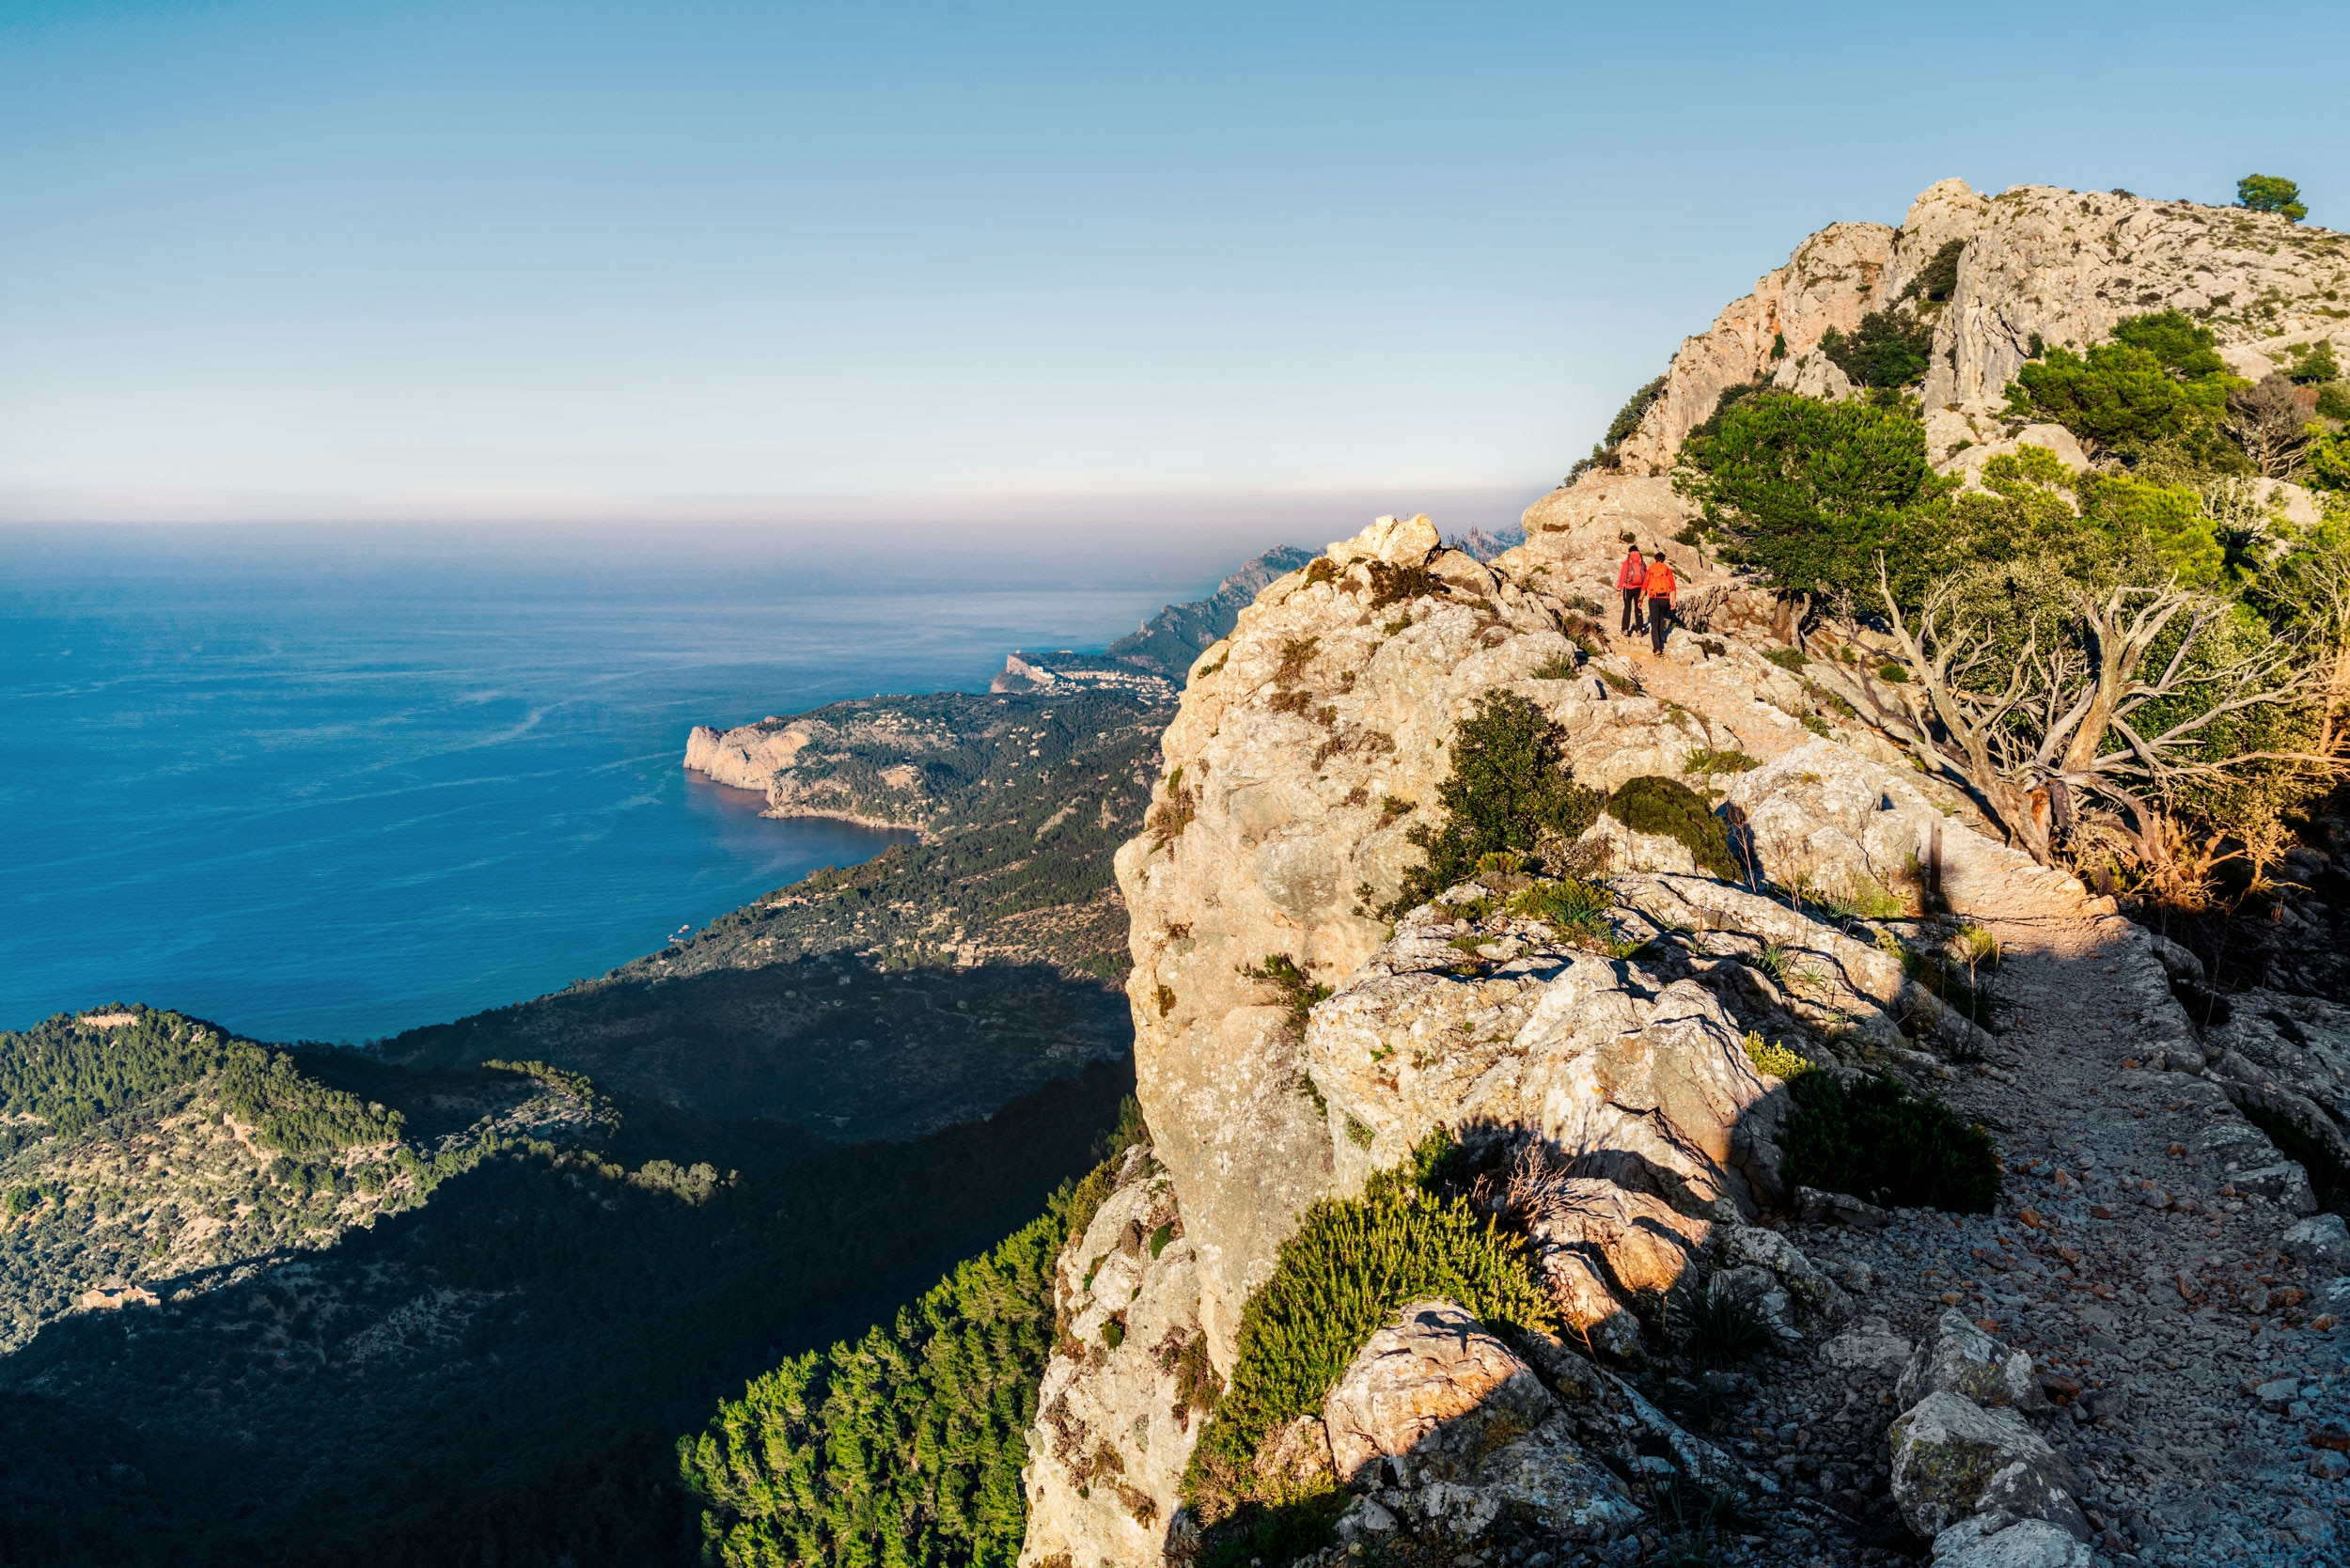 Tourentipps: Wandern auf Mallorca   Bergwelten